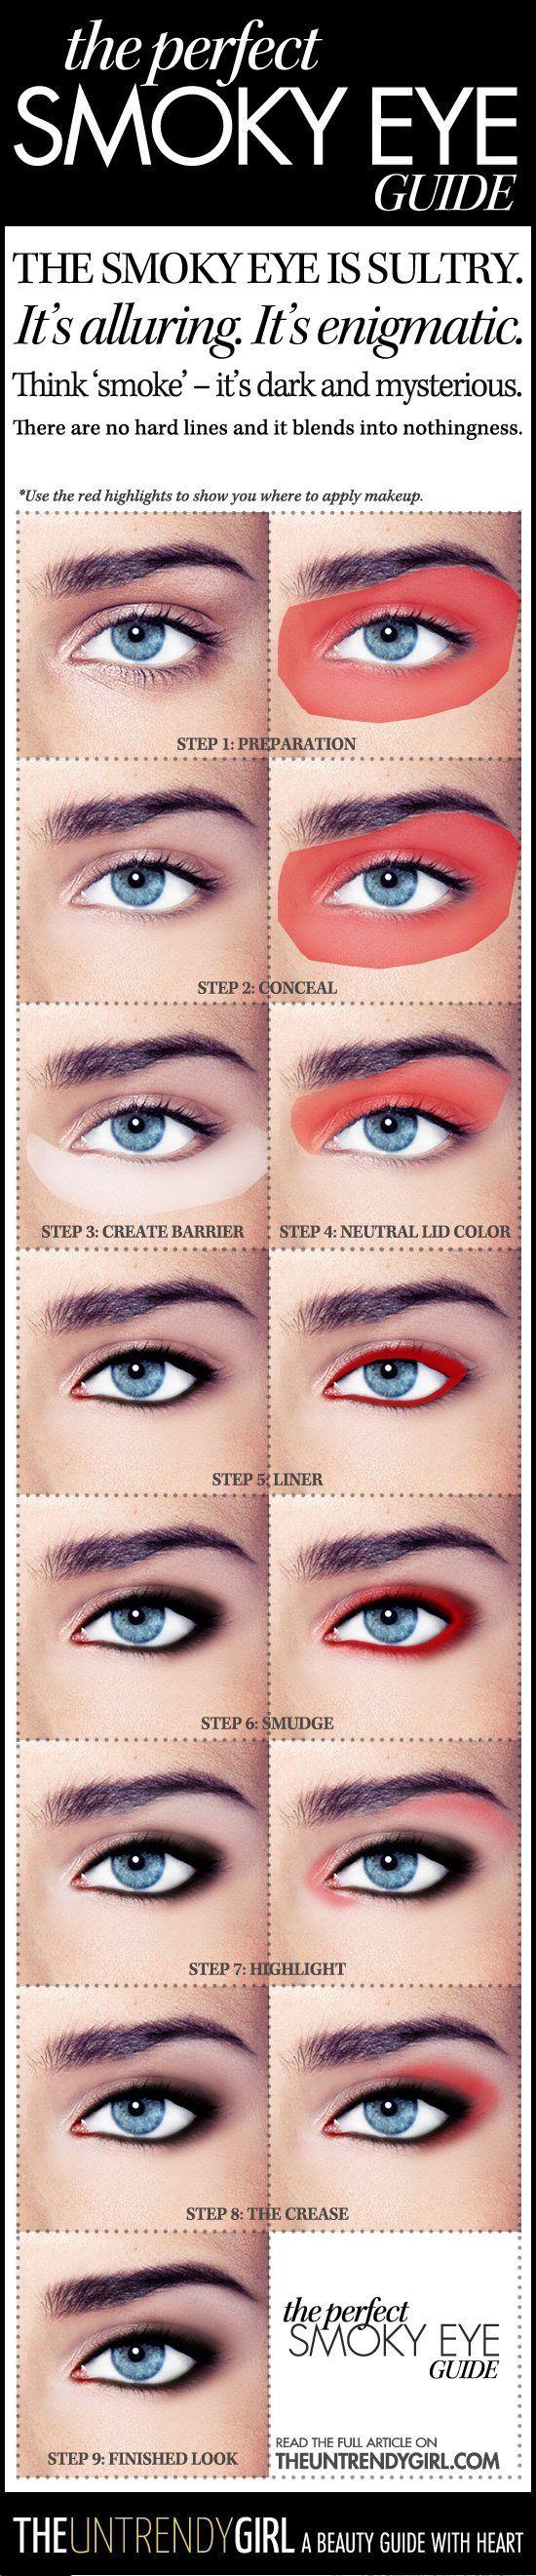 The Perfect Smokey Eye Guide